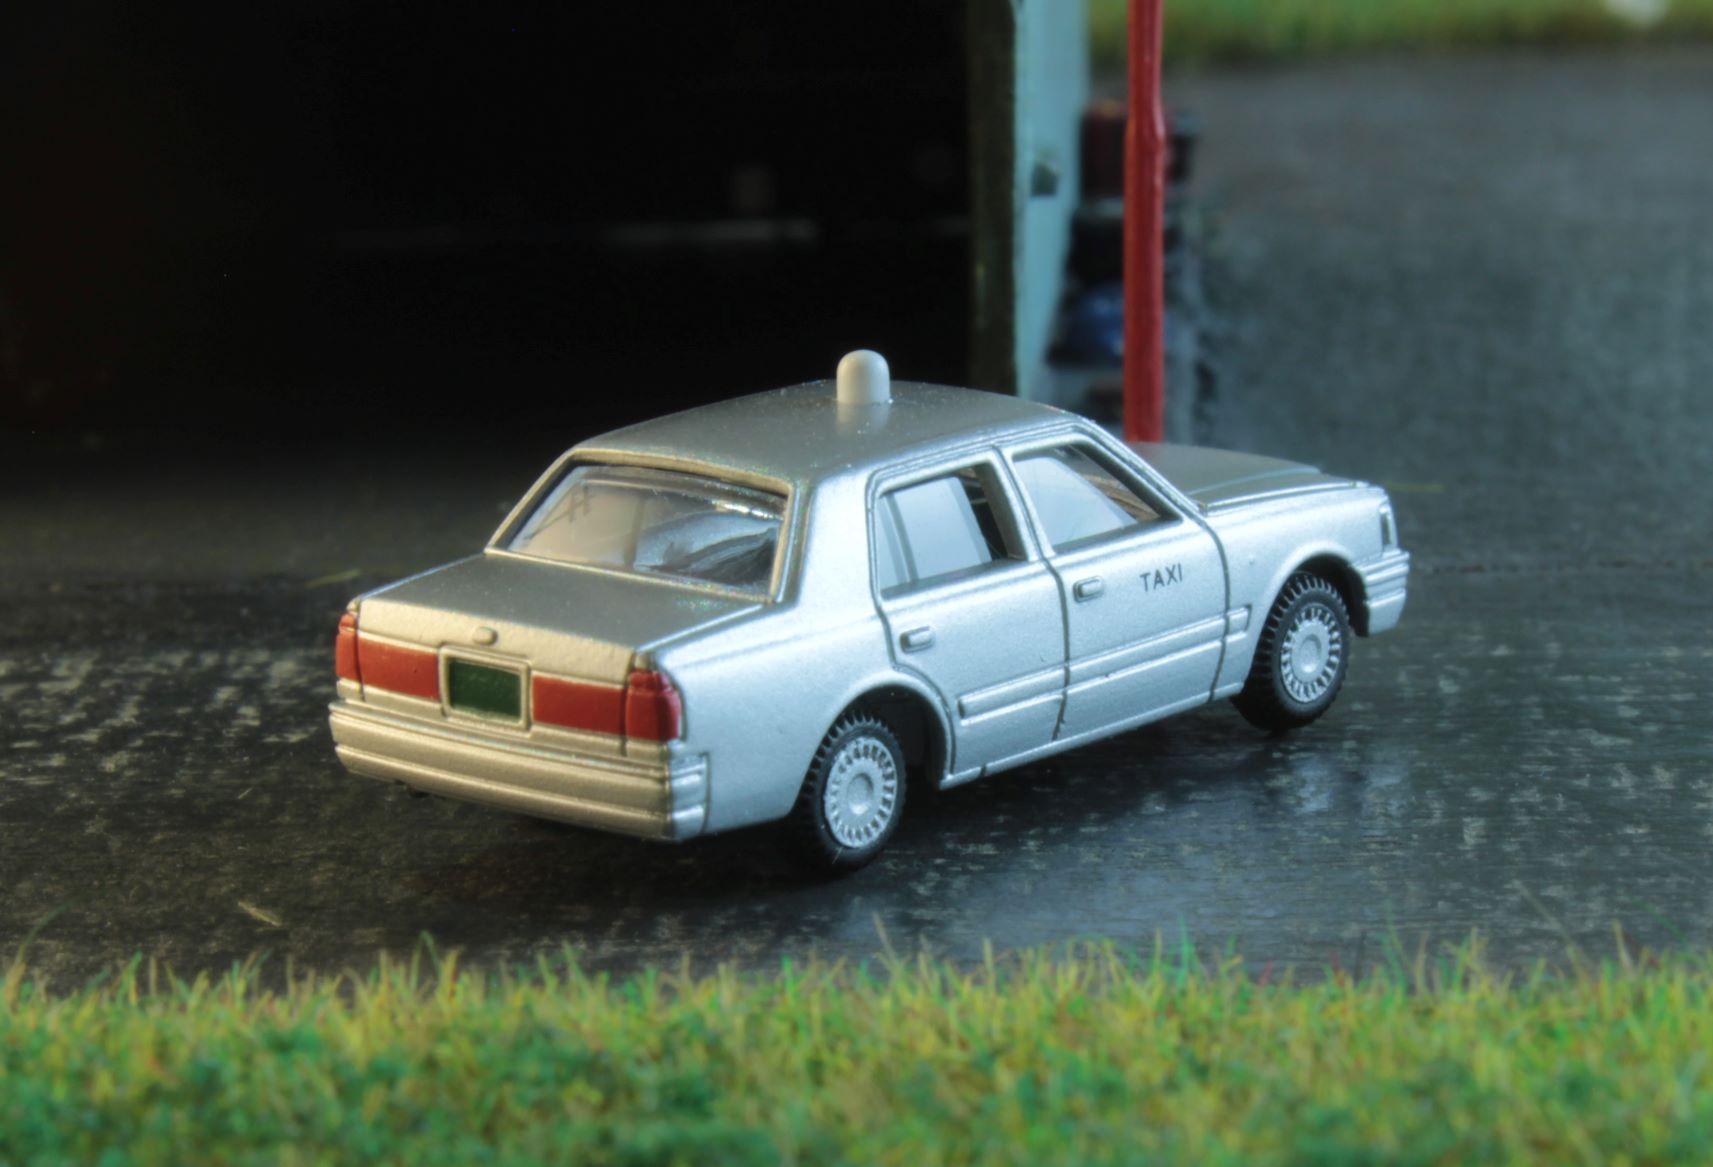 Taxi Nissan .JPG